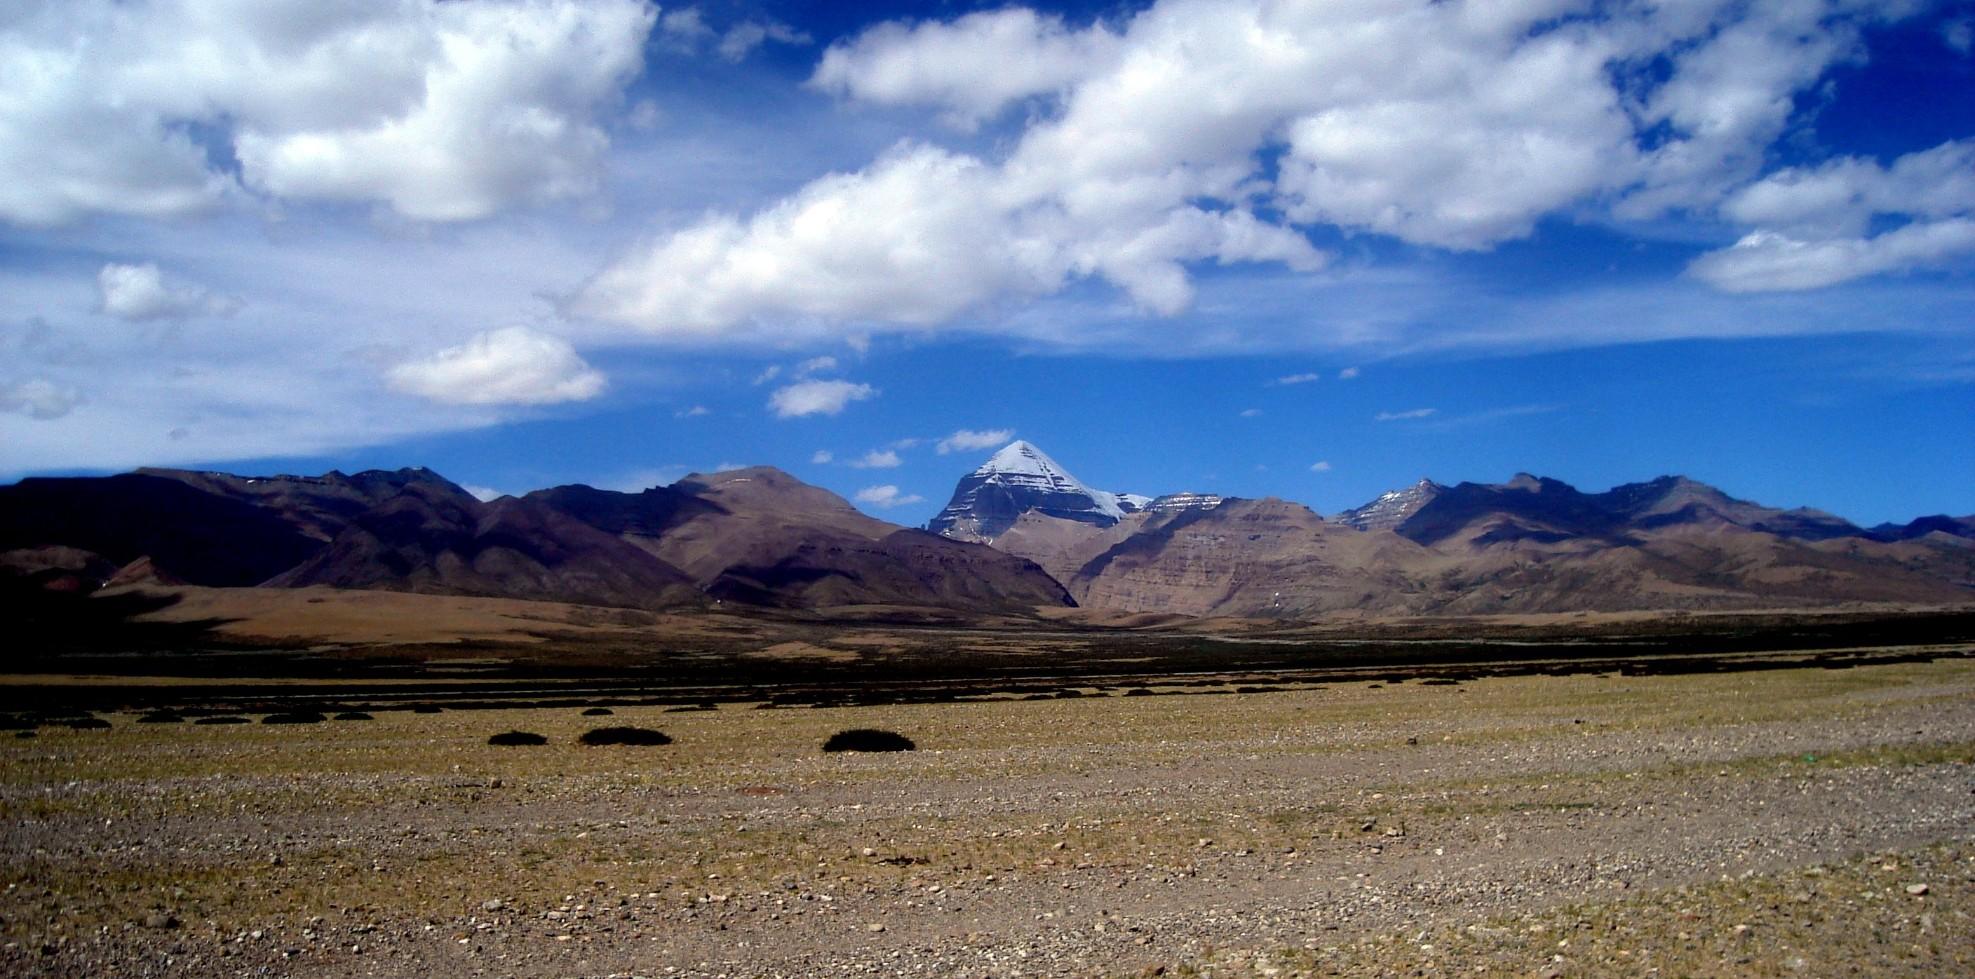 Lhasa Mt. Kailash Guge Kingdom Tour